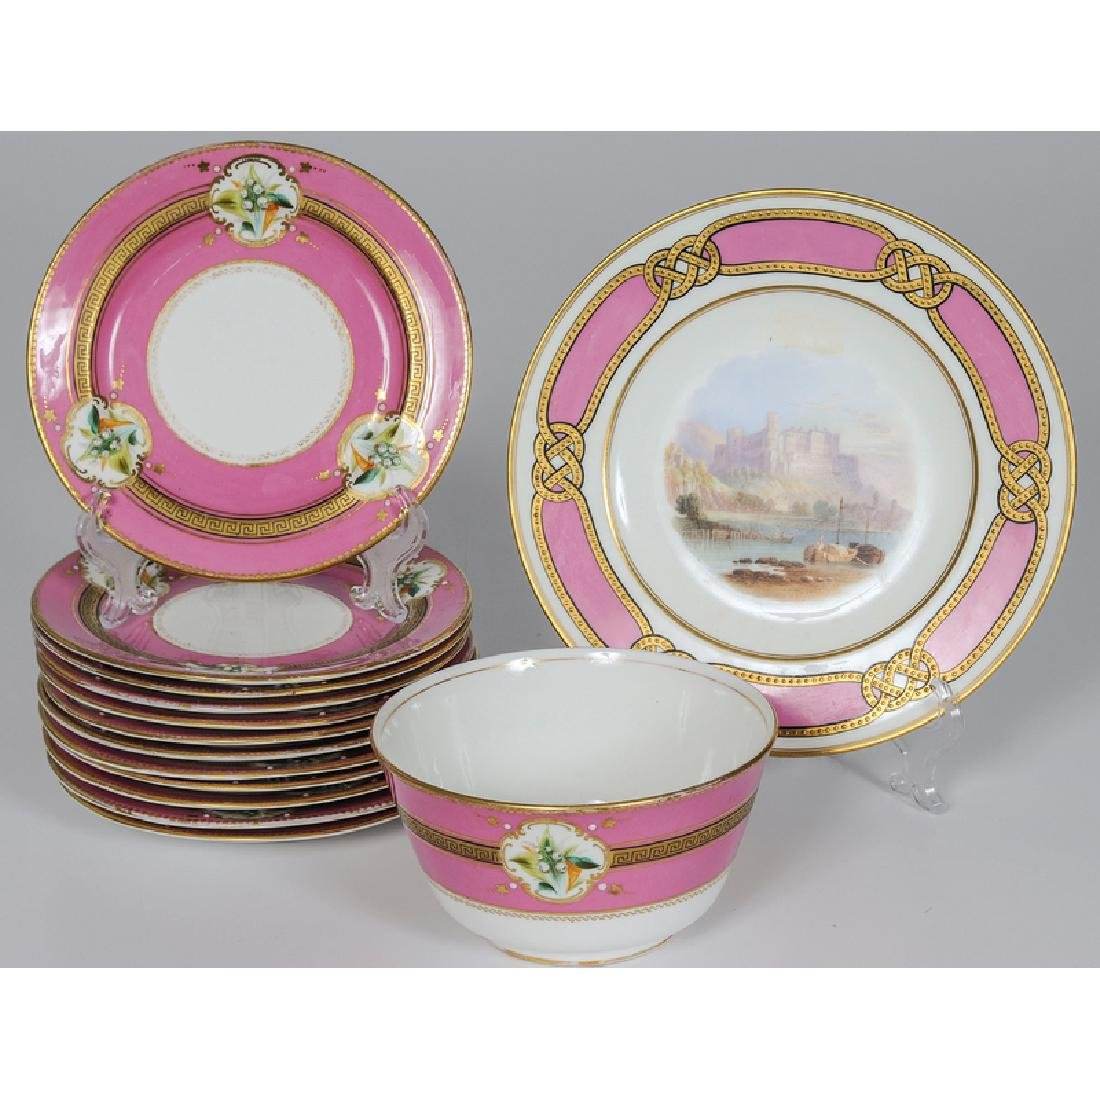 English Porcelain Dessert Plates and Bowl, Plus